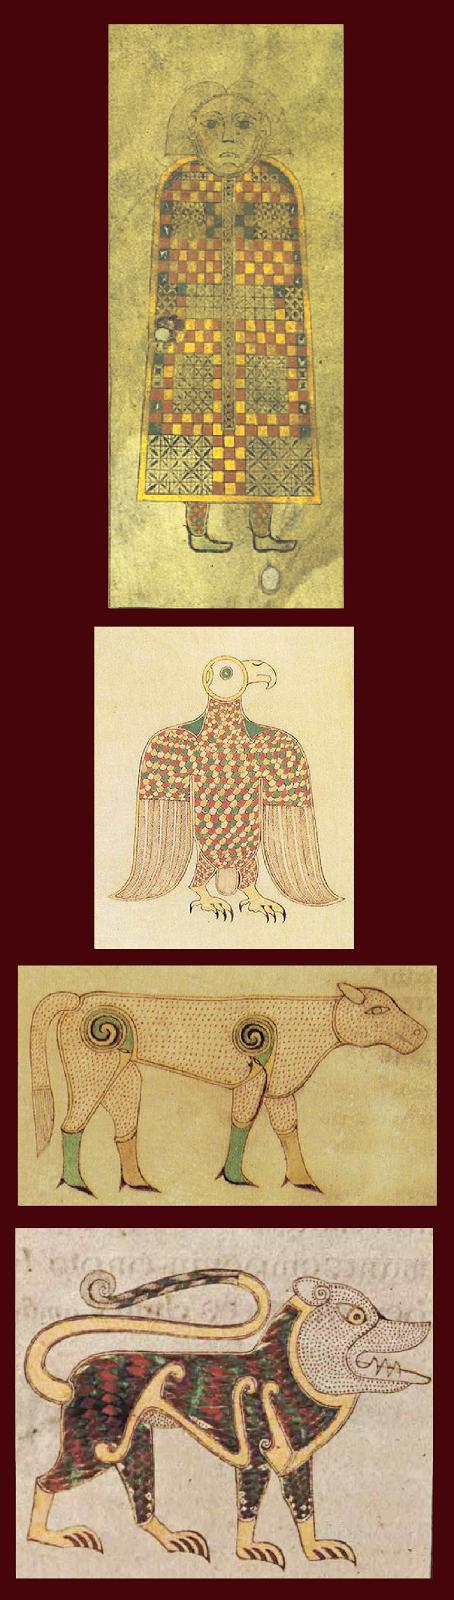 The Text Of The Gospels The Evangelists Symbols Man Lion Ox Eagle